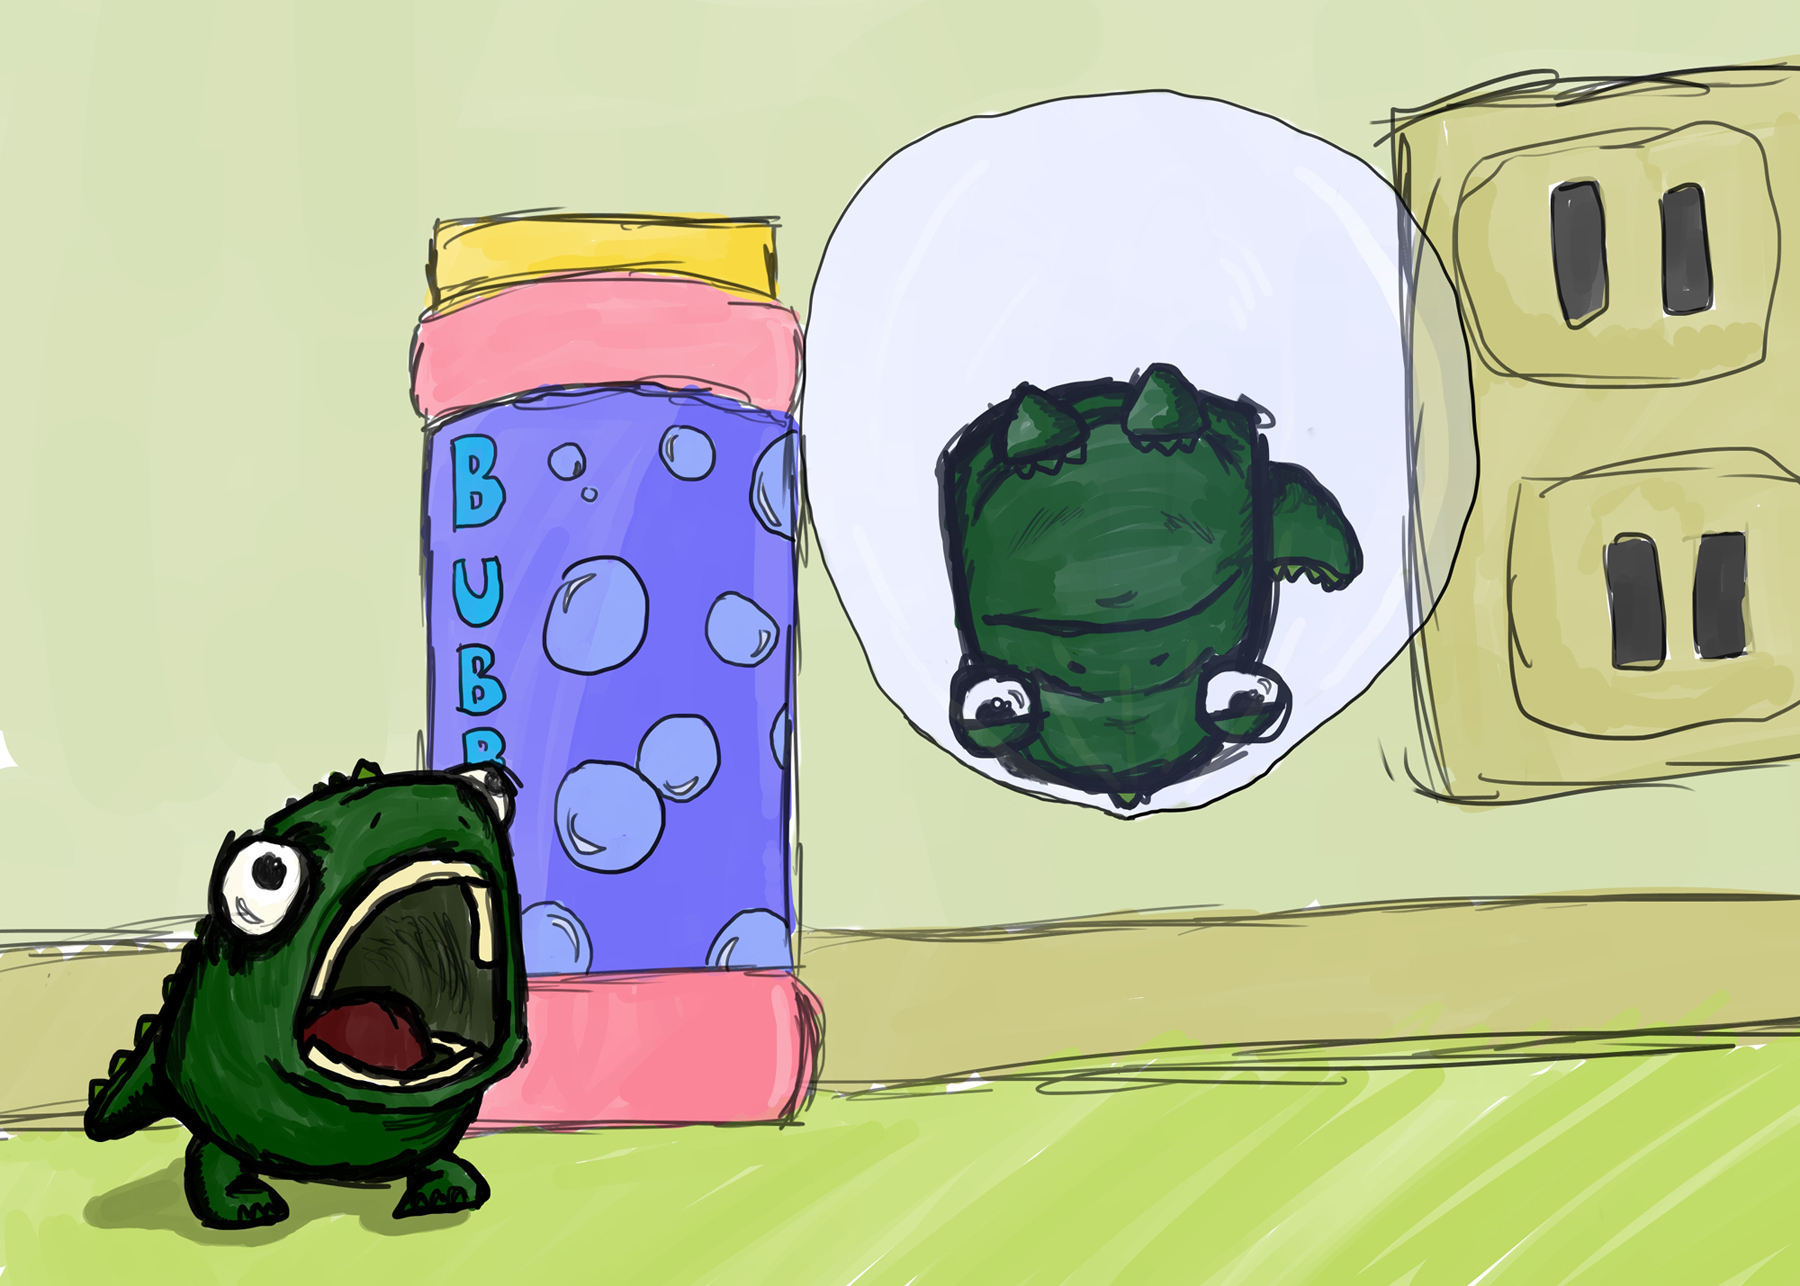 BubbleDinos